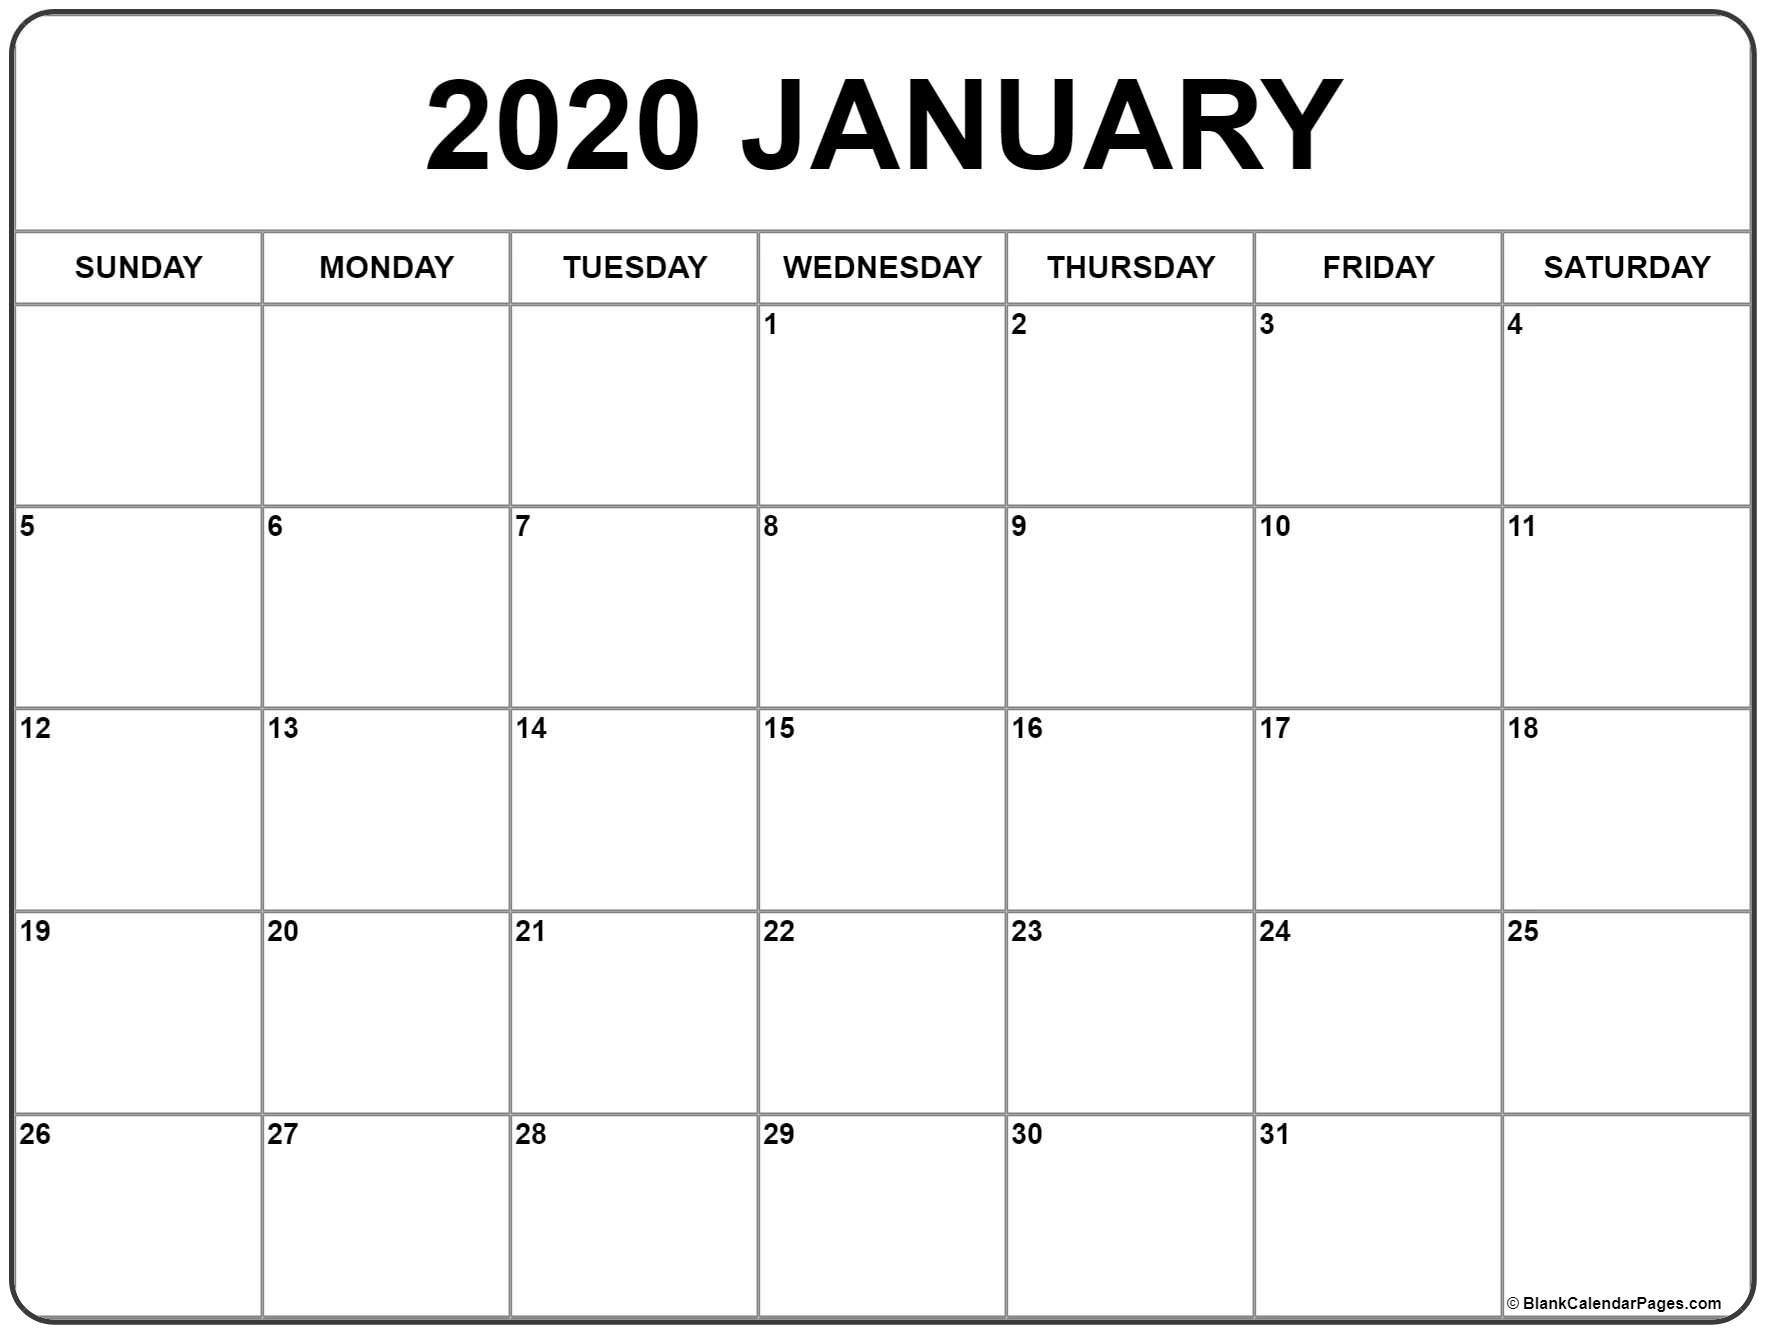 January 2020 Calendar | Free Printable Monthly Calendars-November December January 2020 Calendar